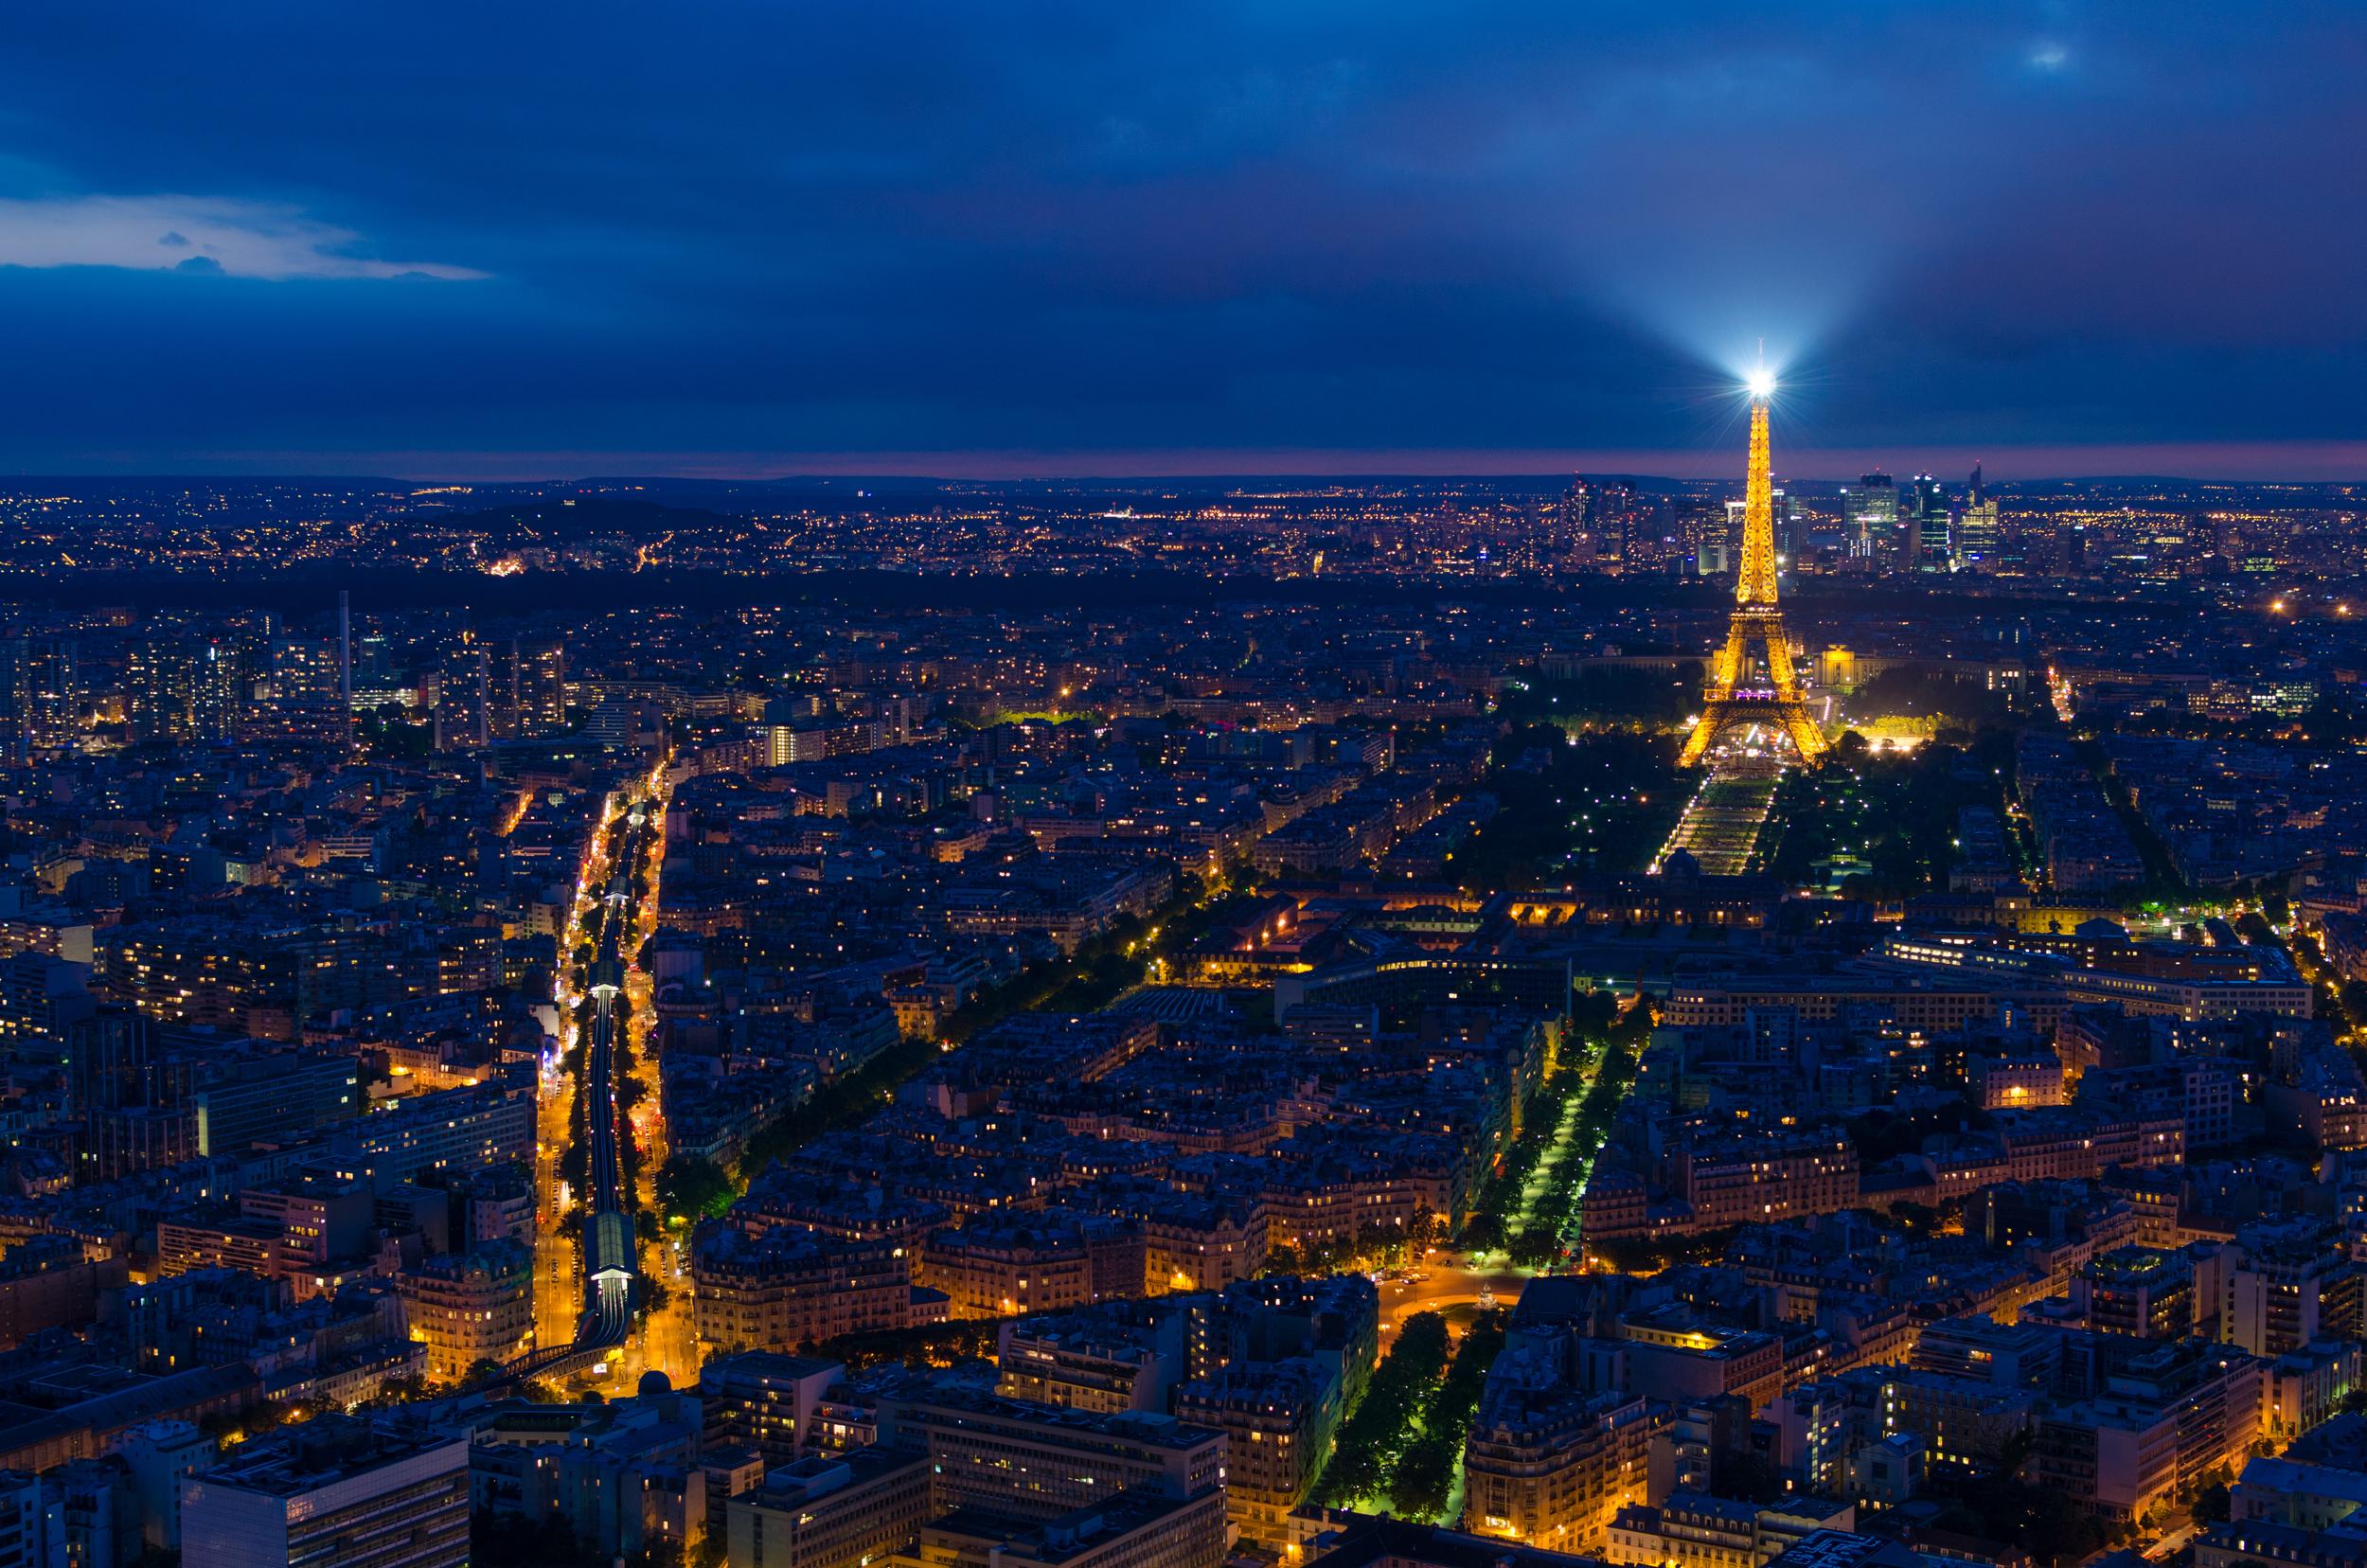 Paris_at_night,_4_July_2013.jpg